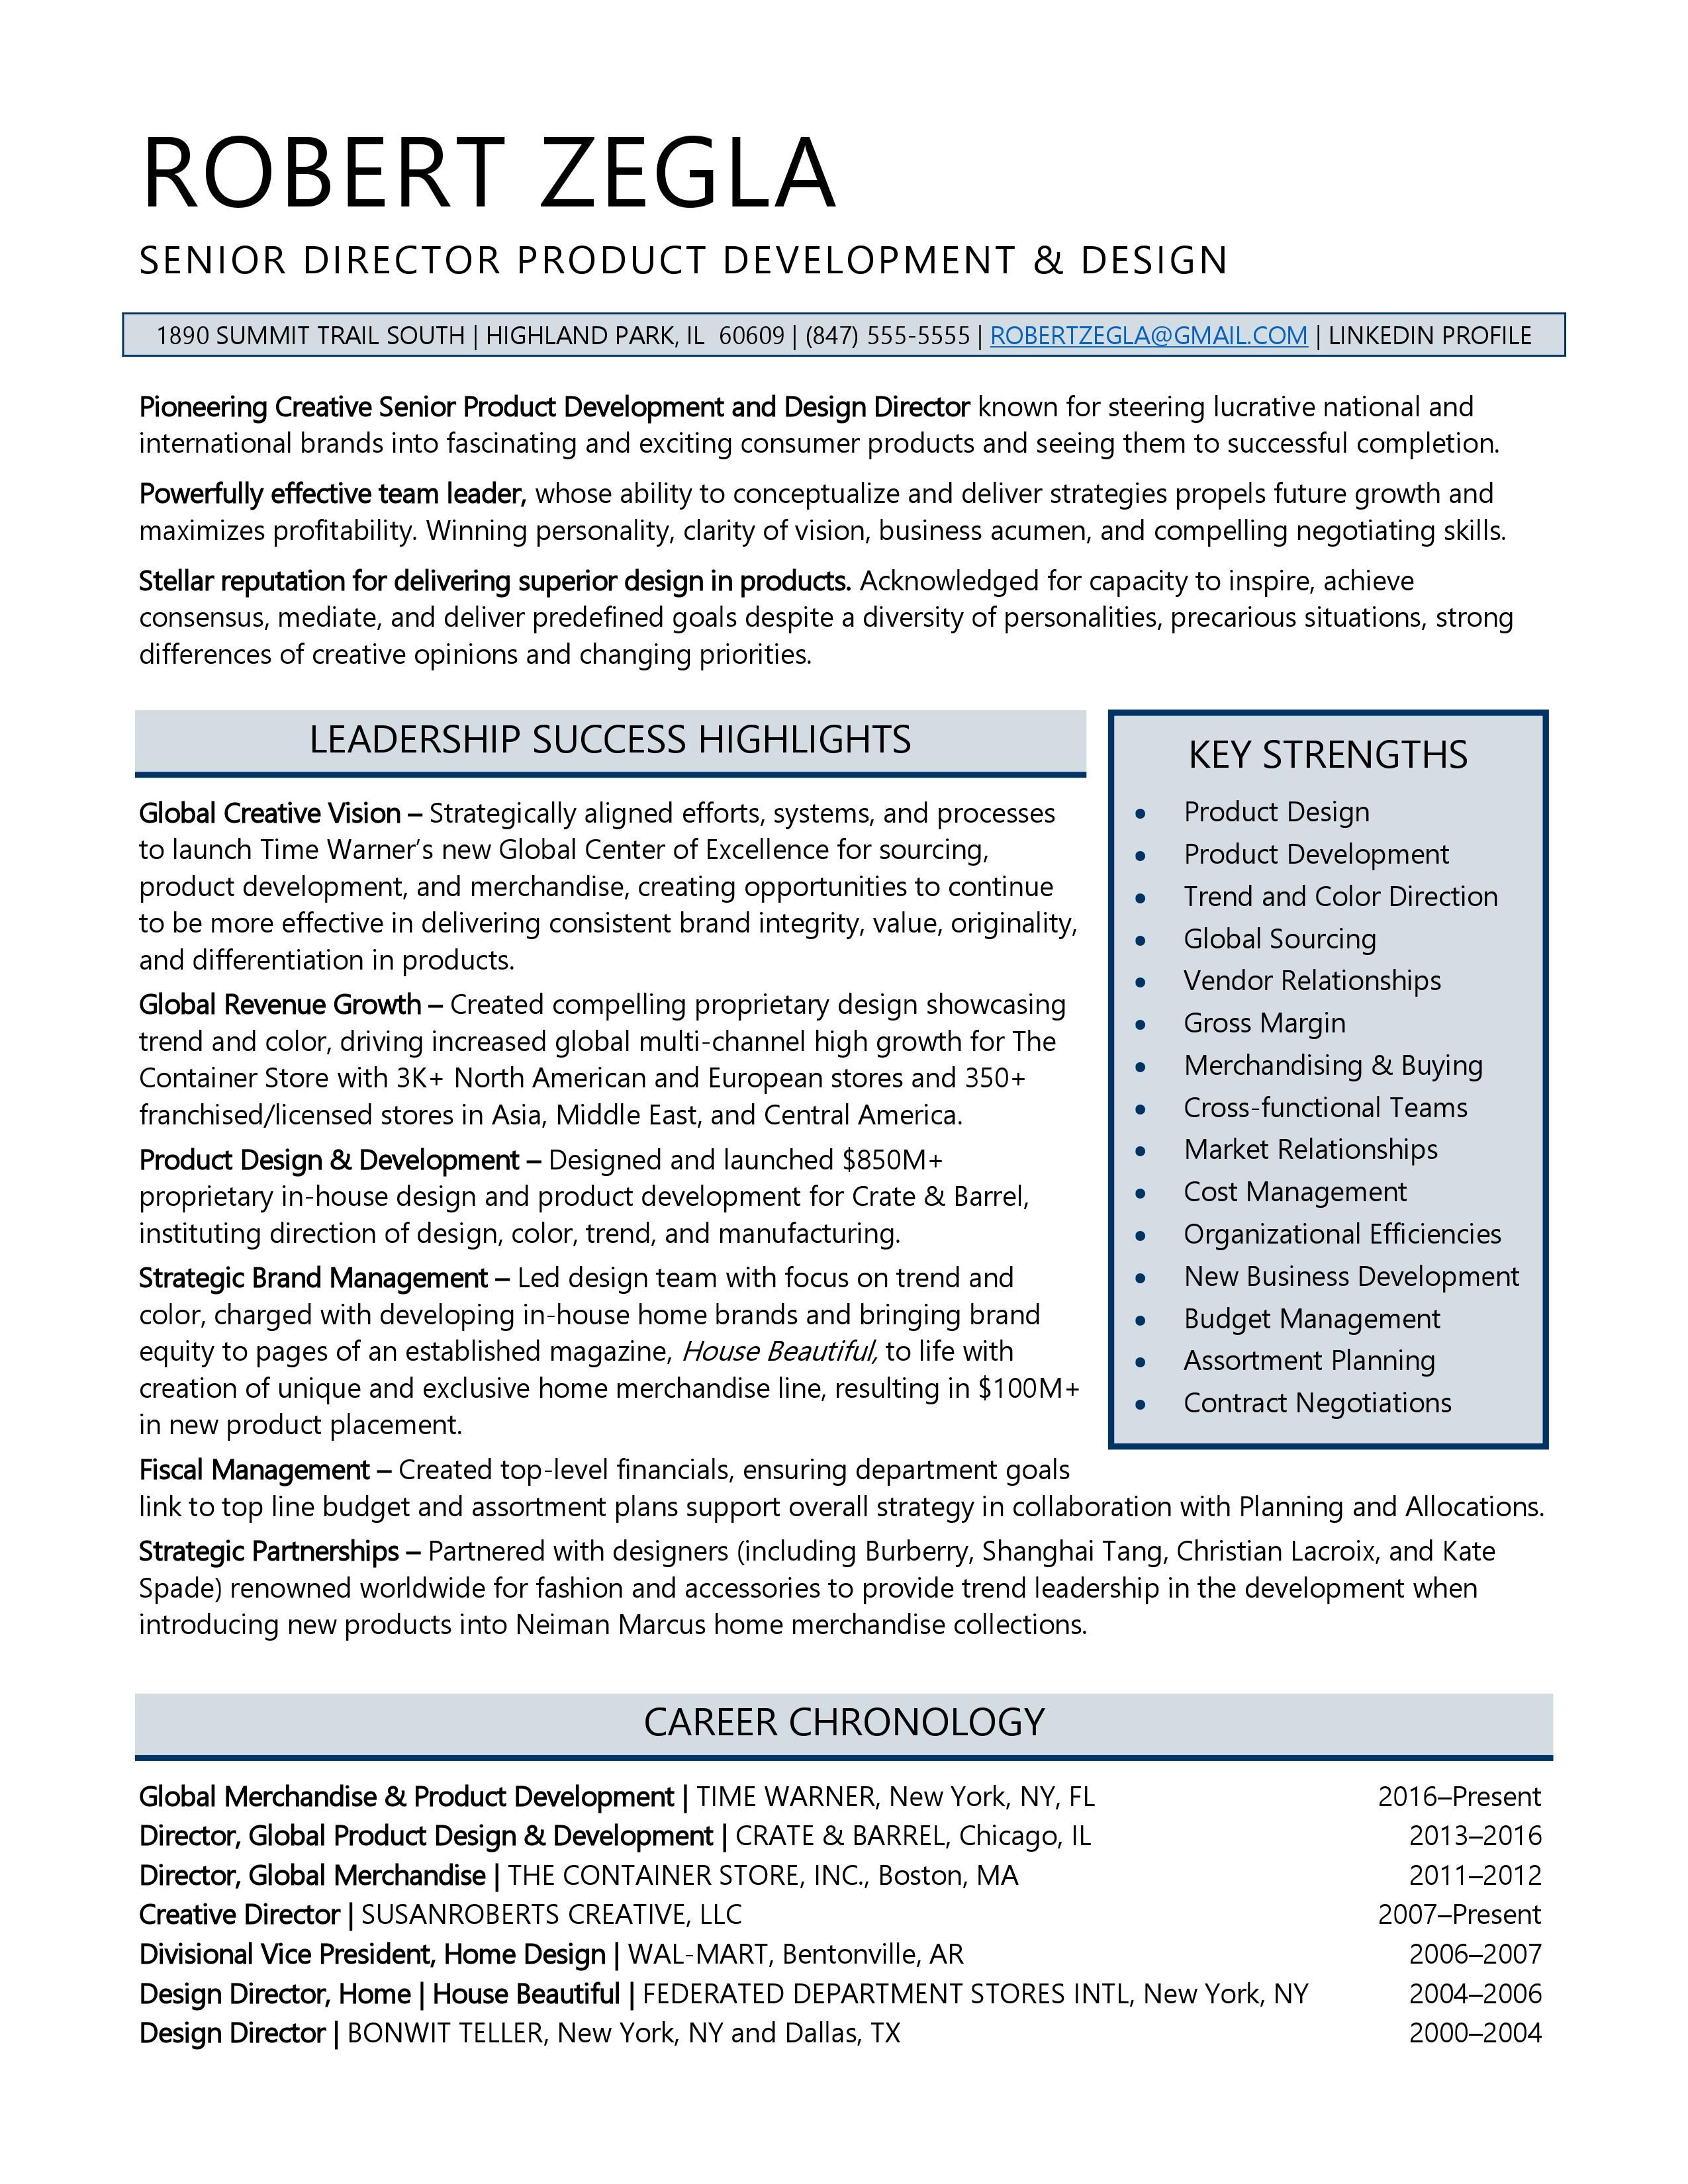 Resume Samples Resume Samples For Freshers Resume Samples For Experienced Resume Samples In Word Sales Resume Examples Resume Examples Job Resume Examples